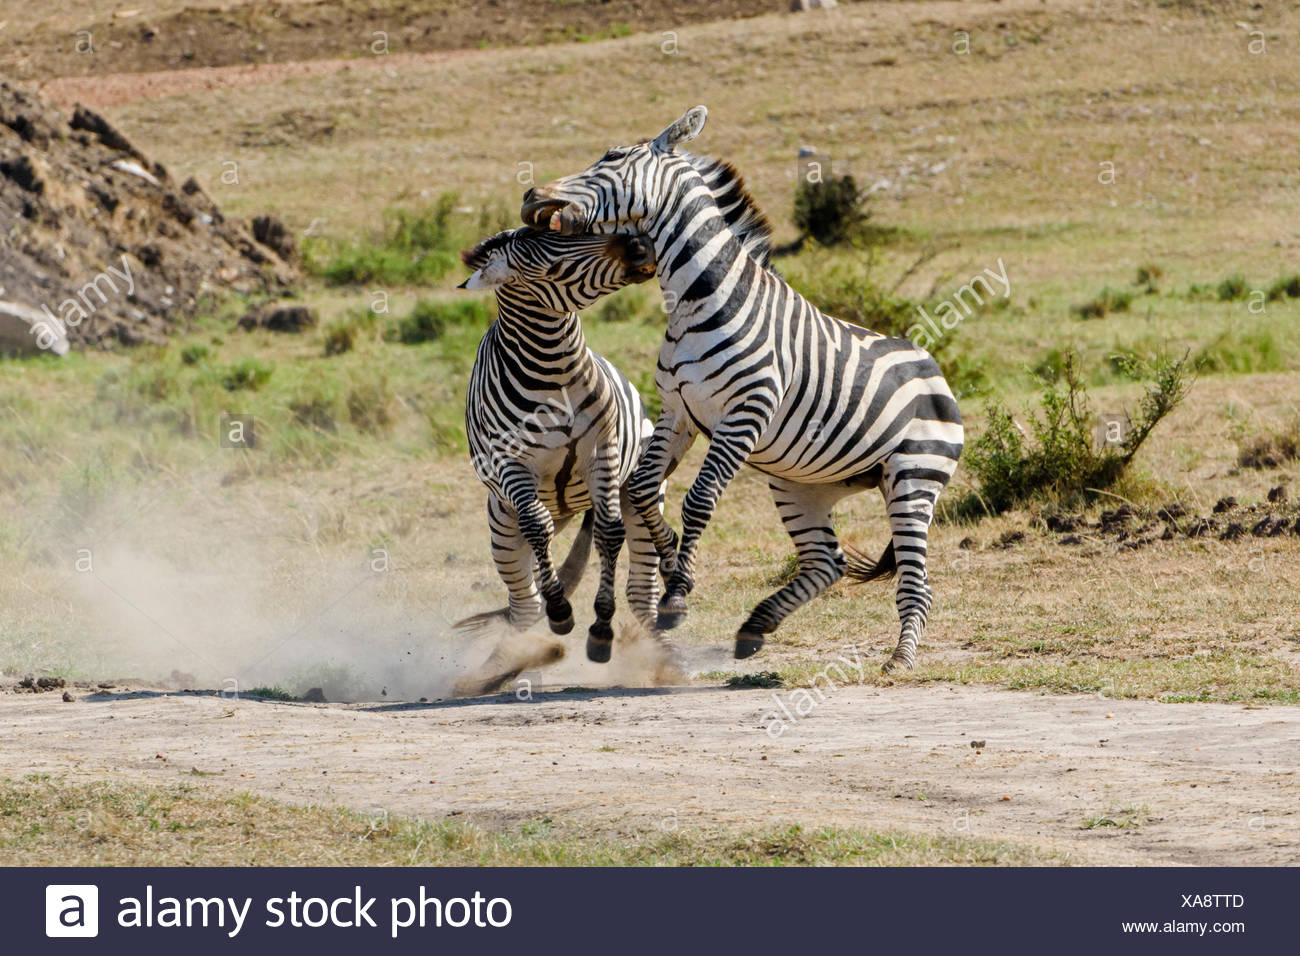 Zebras (Equus quagga), stallions fighting, Maasai Mara National Reserve, Narok County, Kenya - Stock Image